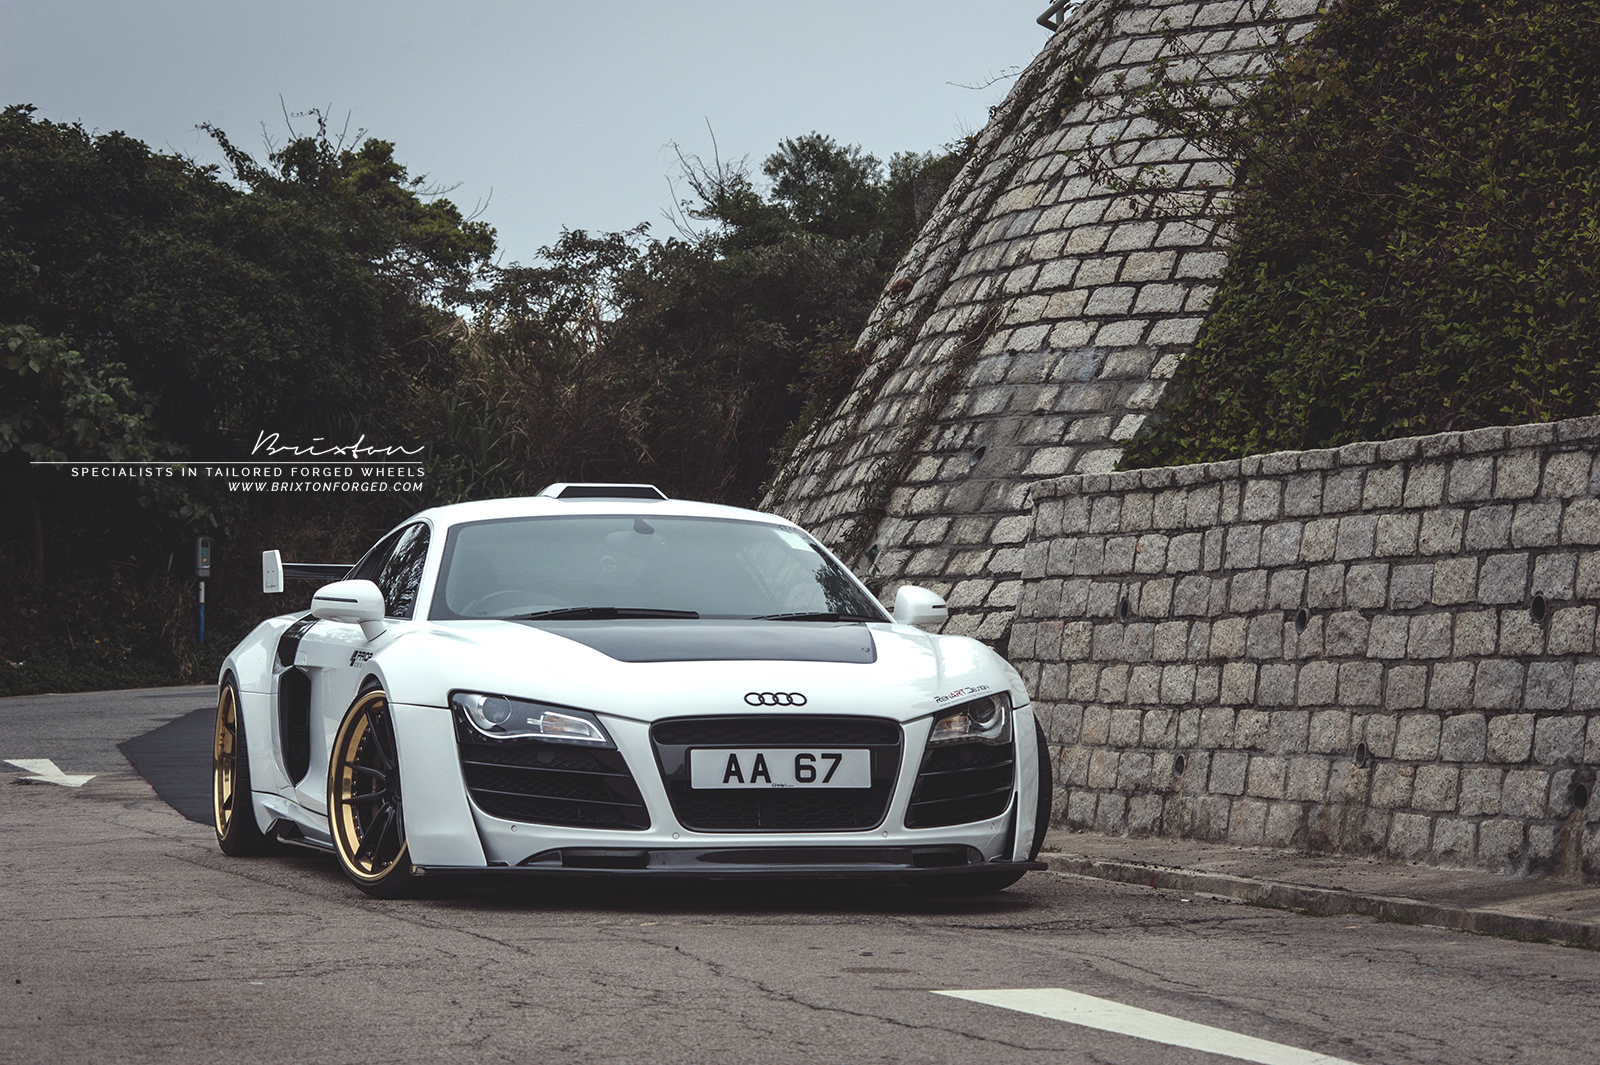 brixton-forged-wheels-prior-design-r8-reinart-design-white-audi-r8-brixton-m53-targa-series-forged-wheels-gold-02.jpg